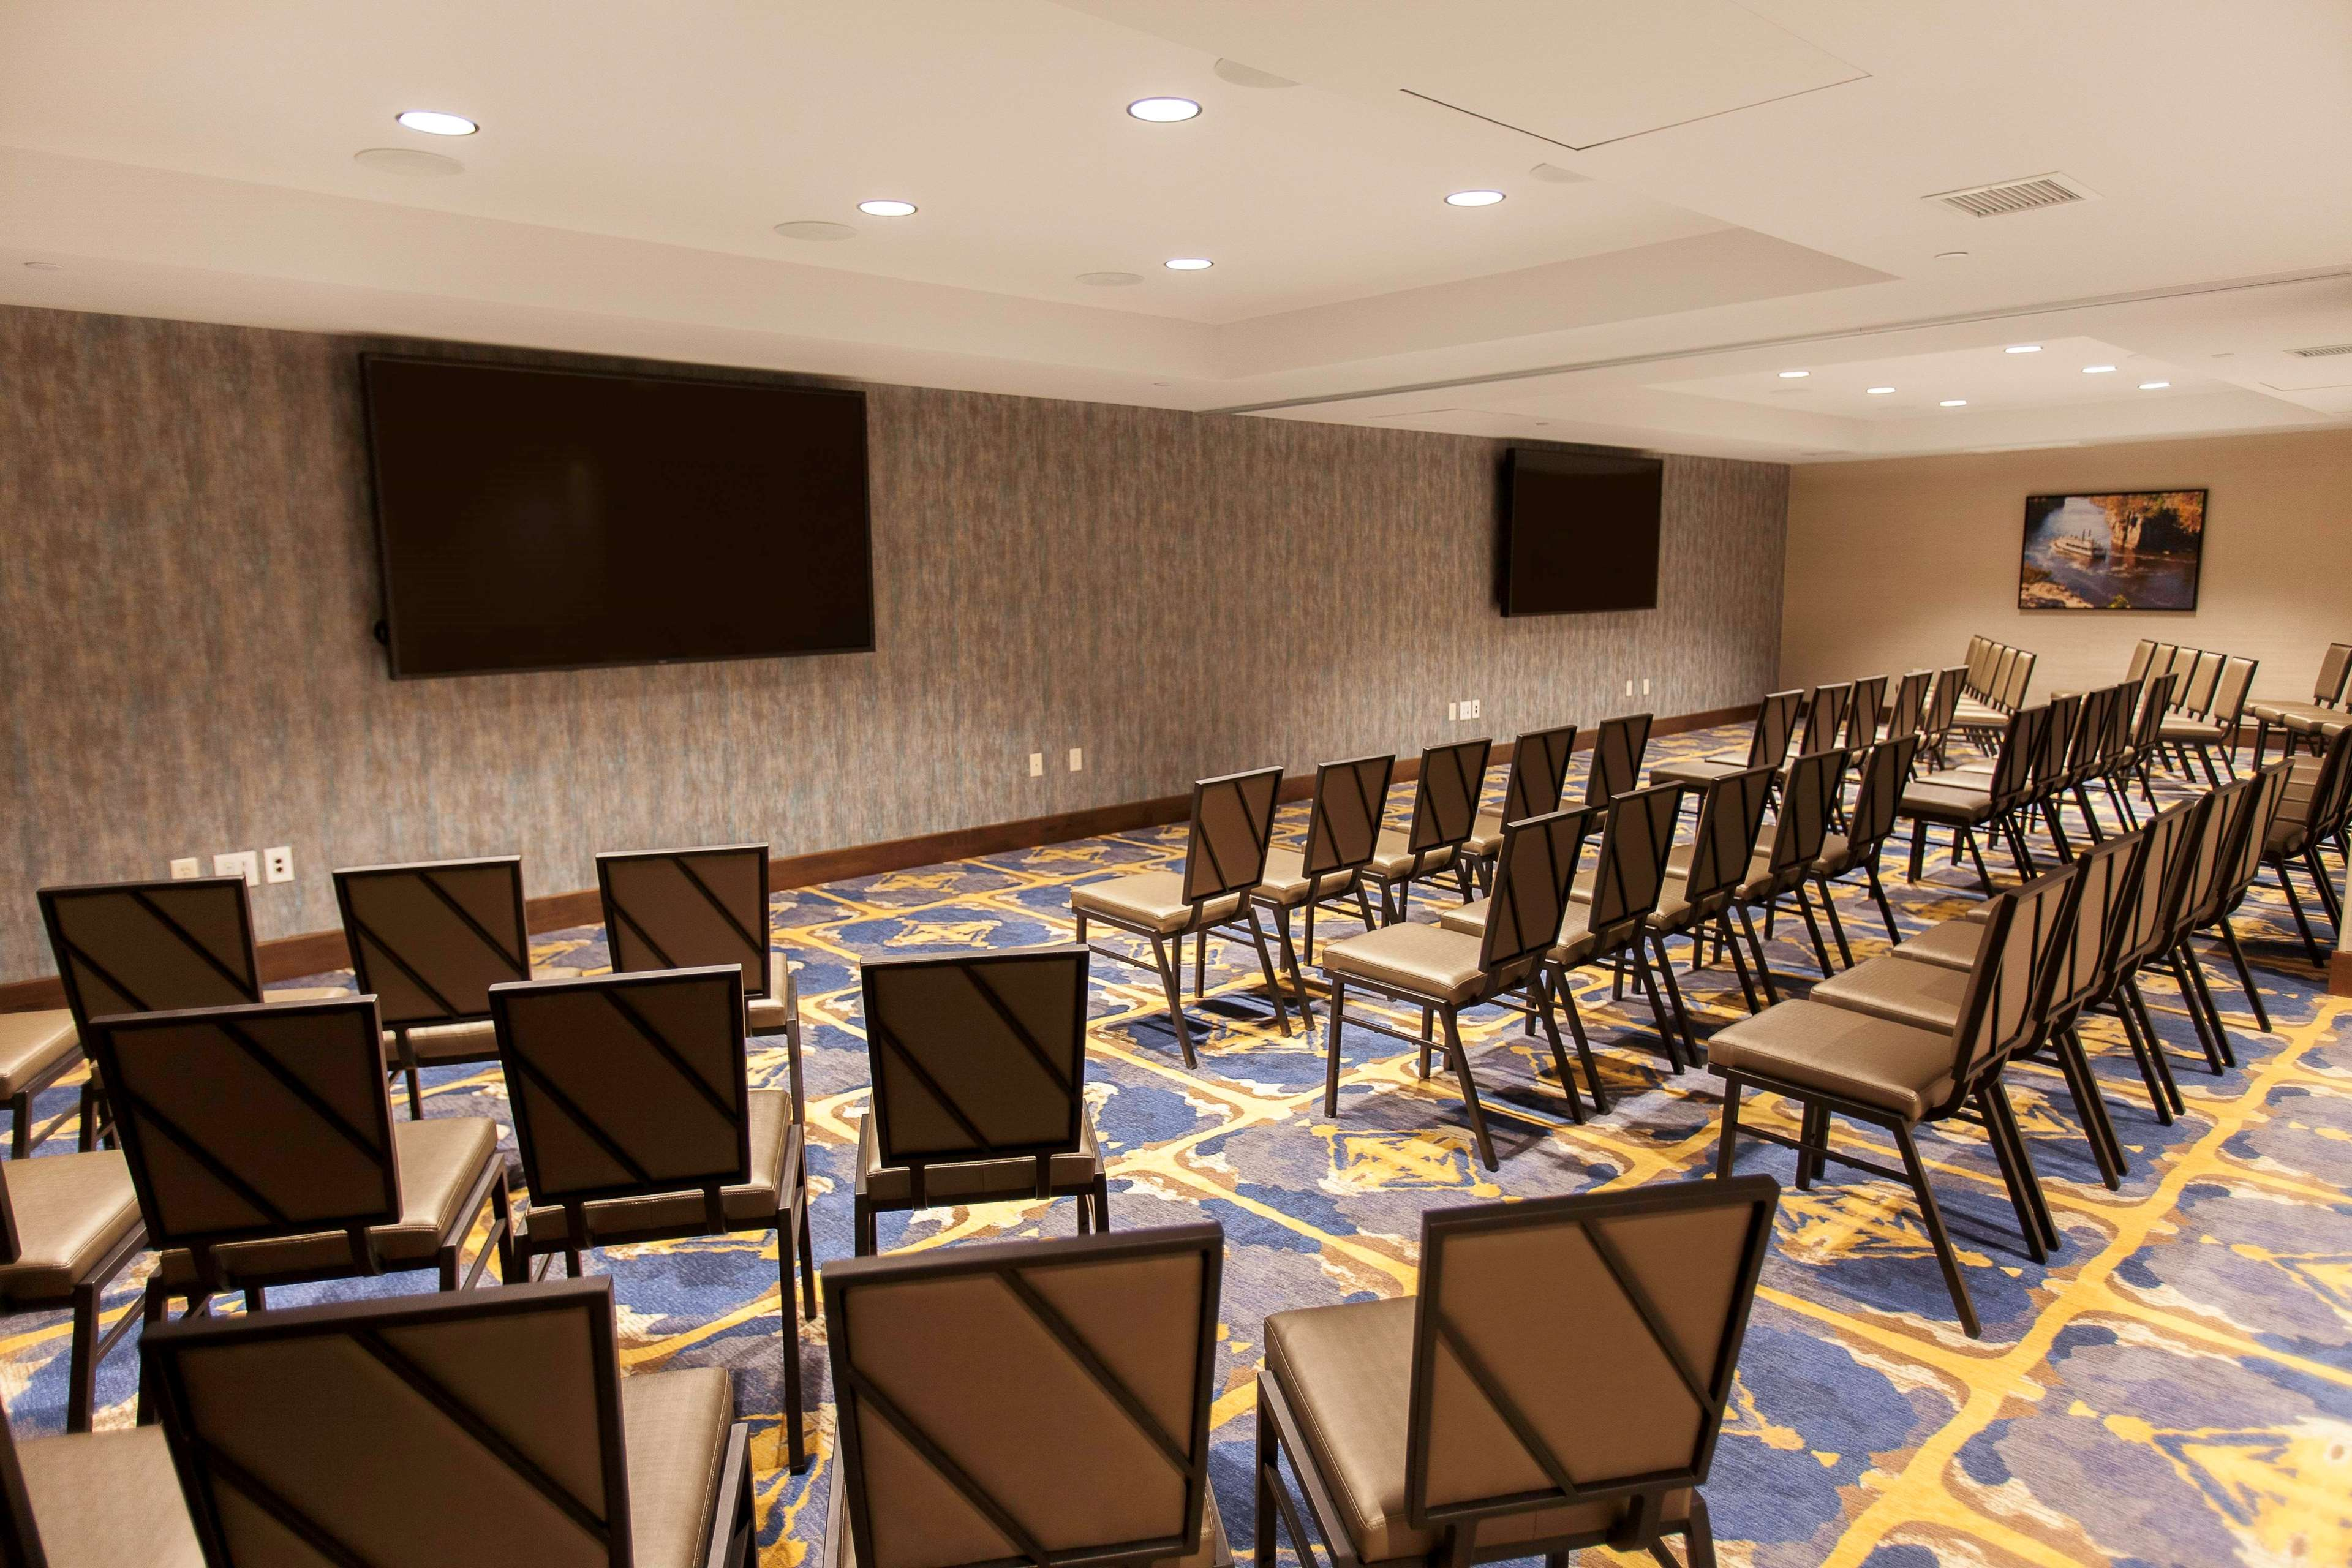 DoubleTree by Hilton Hotel Minneapolis - University Area image 0